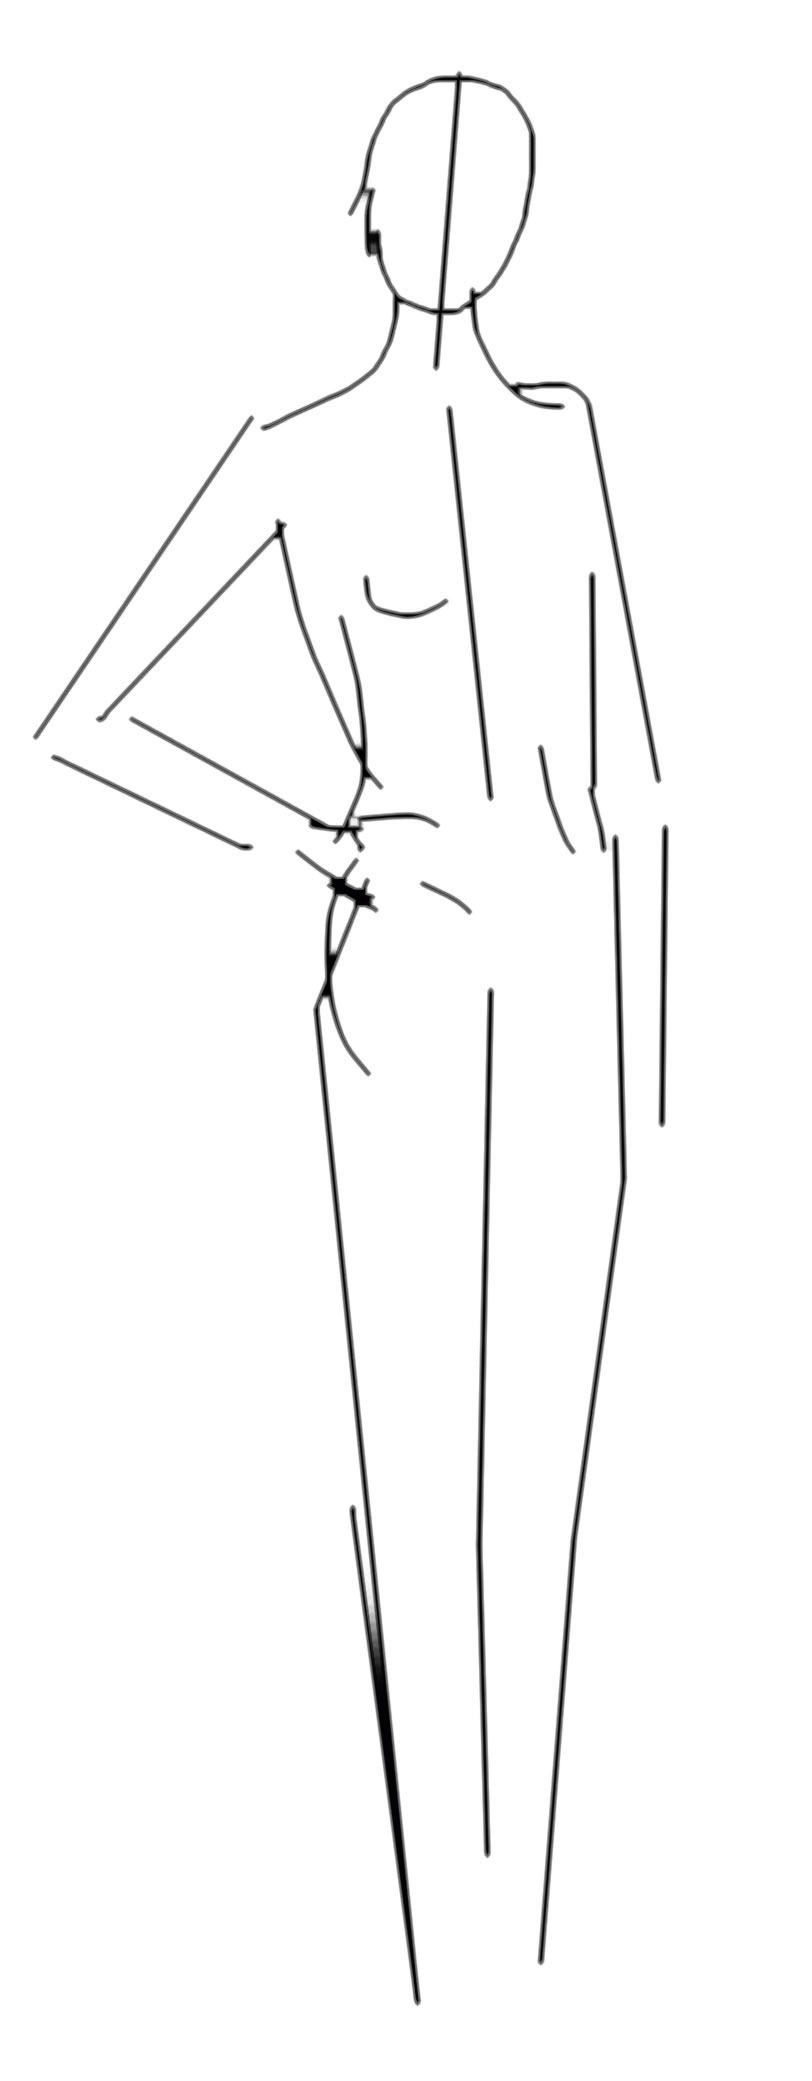 Sketch of model pose